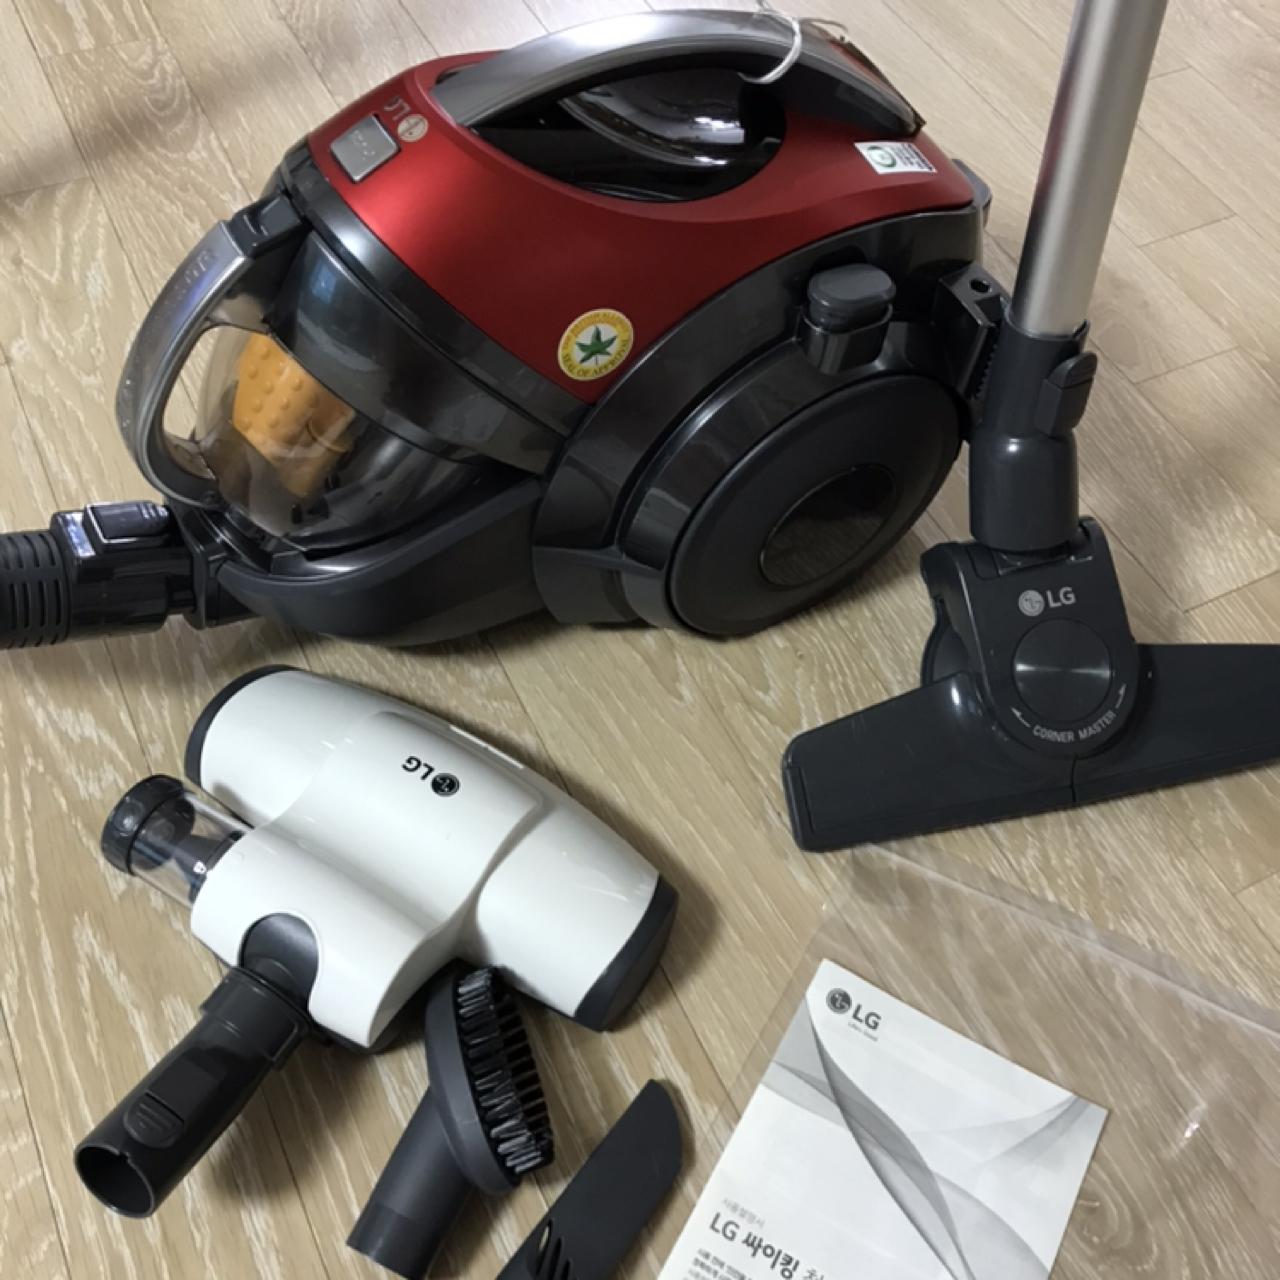 LG 싸이킹청소기,아이클레보 로봇청소기 팔아요^^